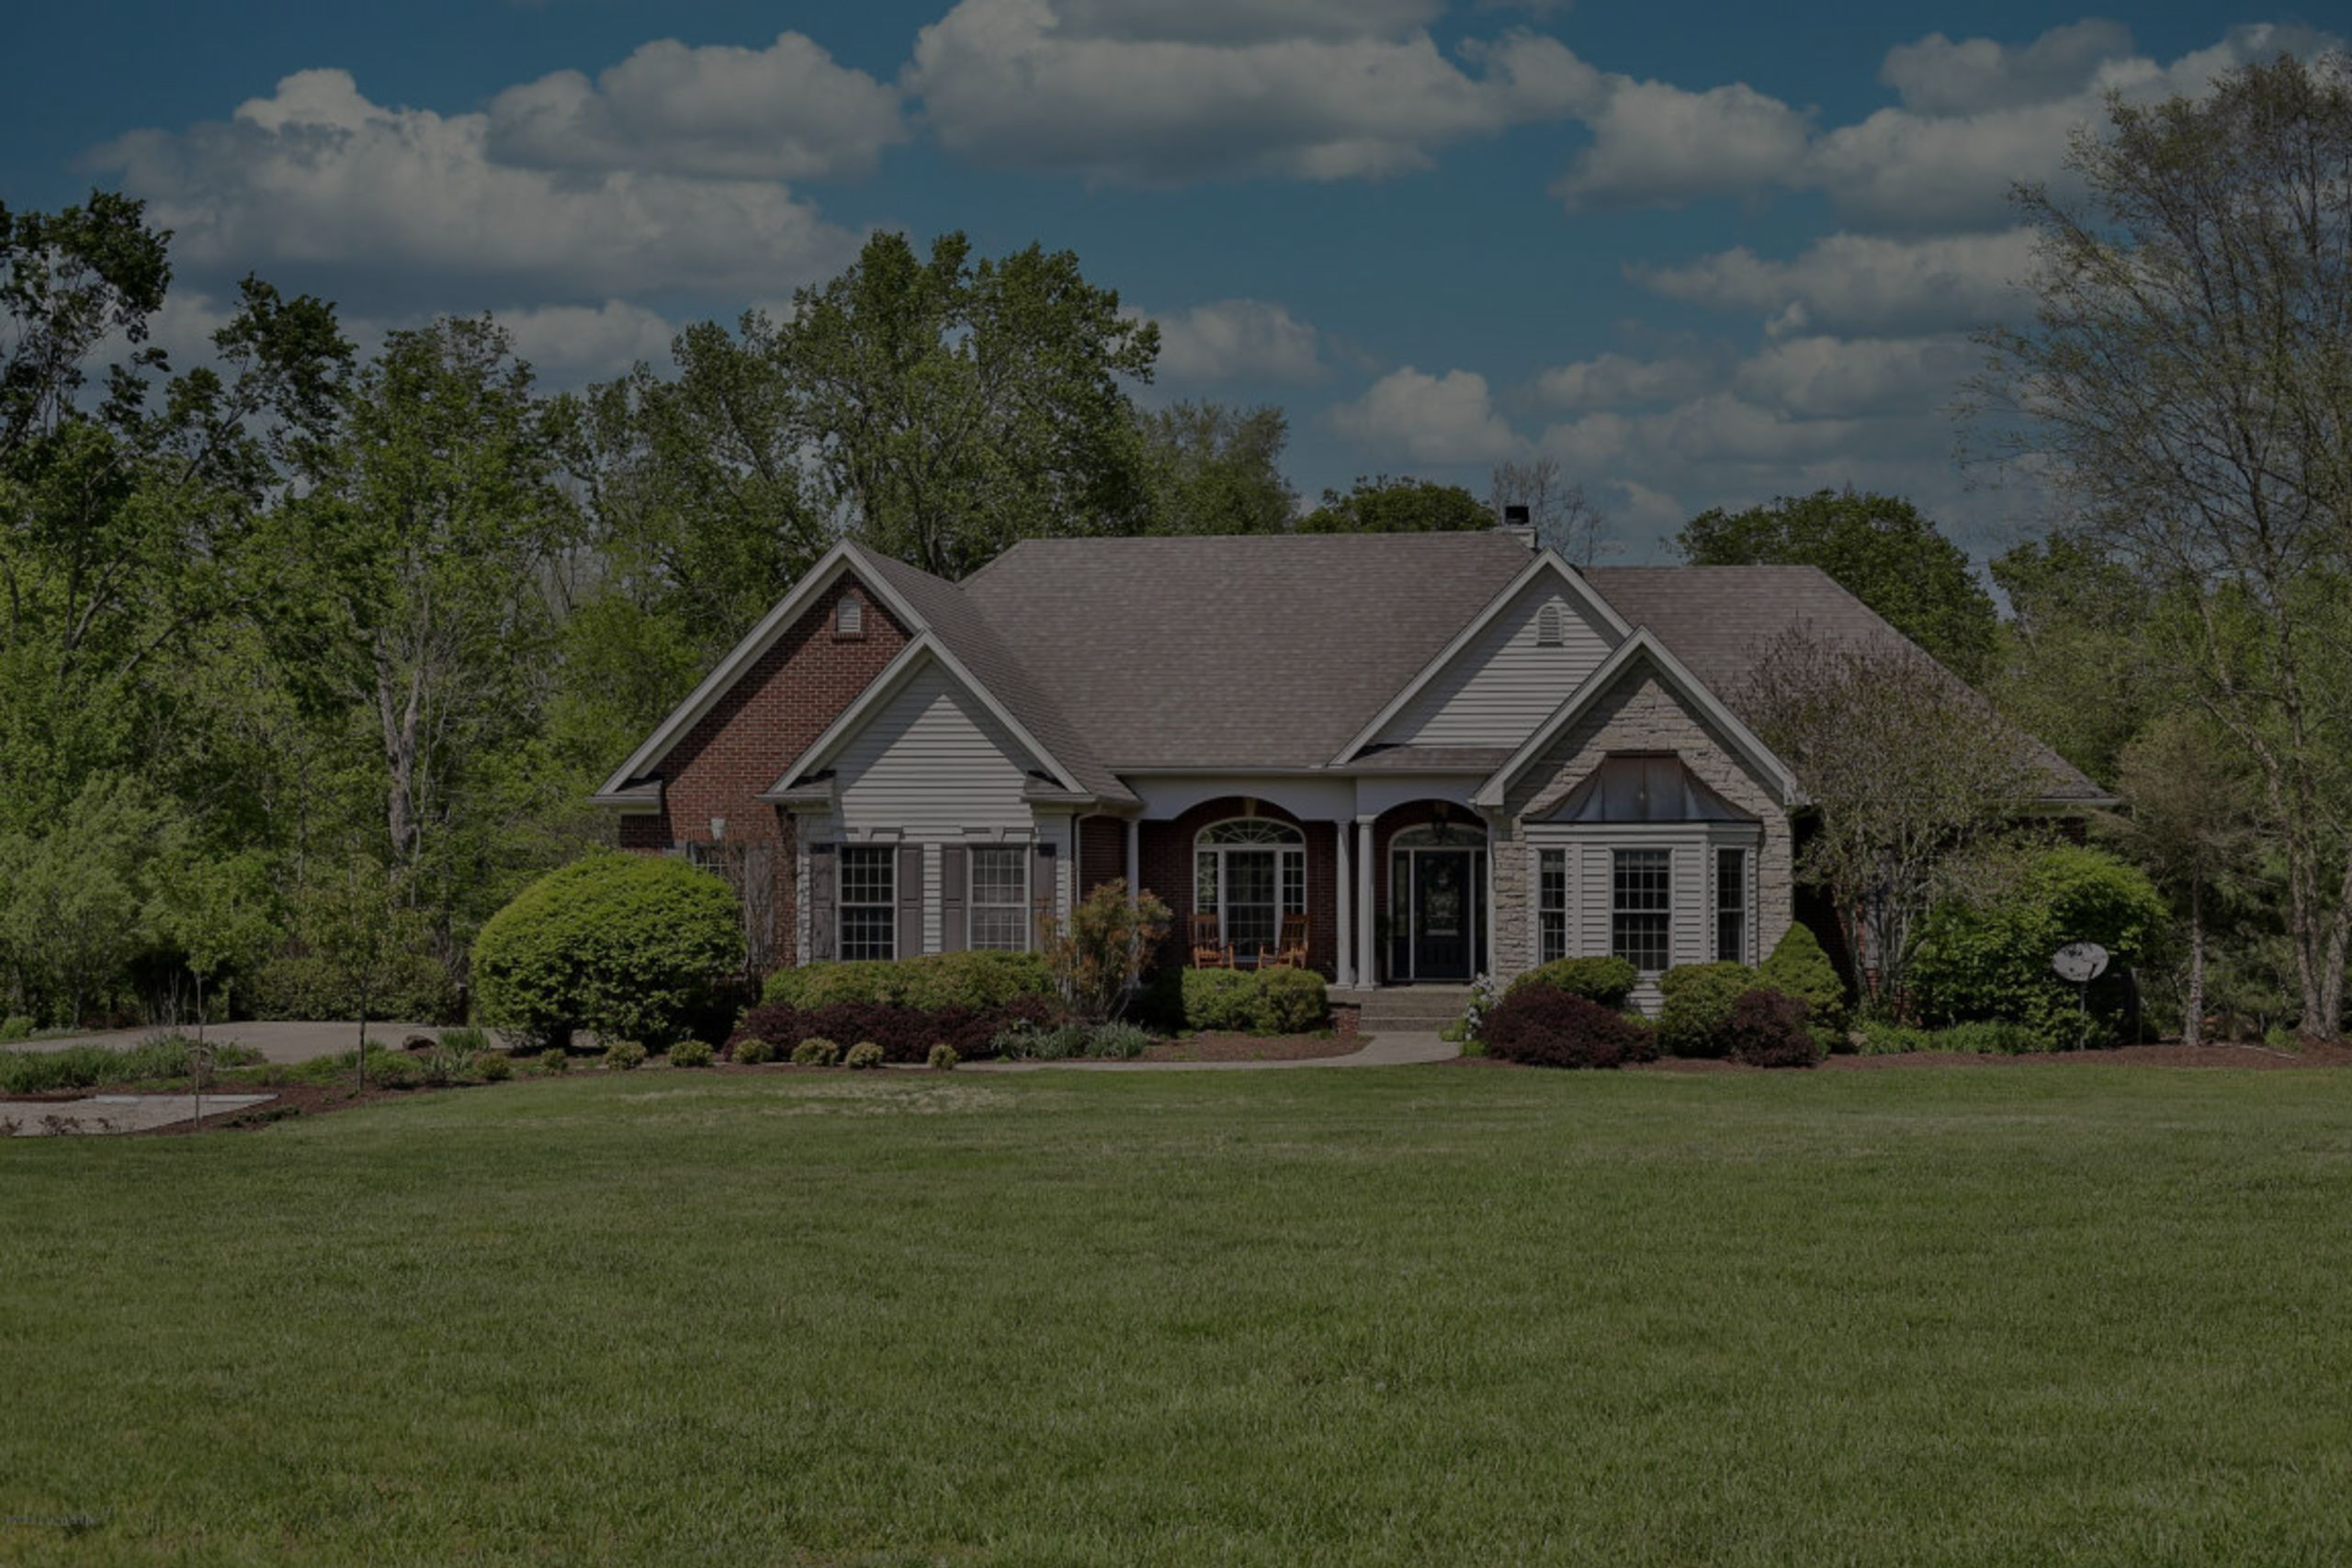 For Sale! 215 Owl Ridge Rd, Shelbyville, KY 40065